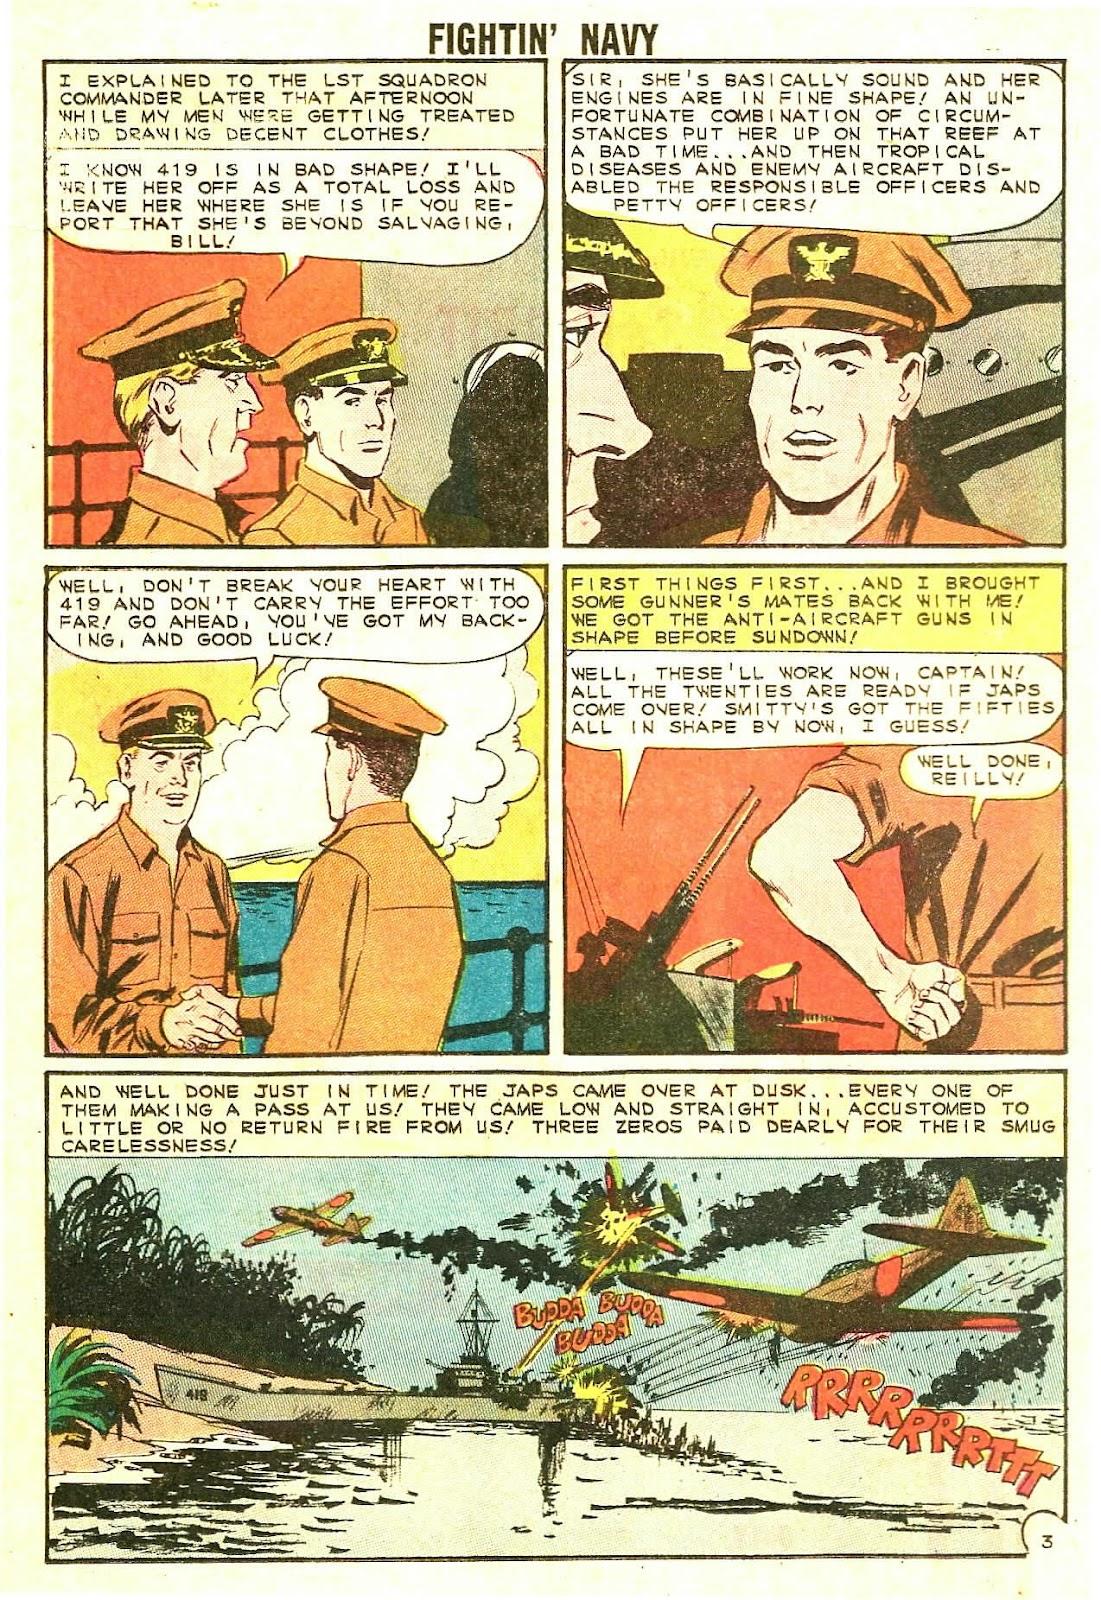 Read online Fightin' Navy comic -  Issue #114 - 16